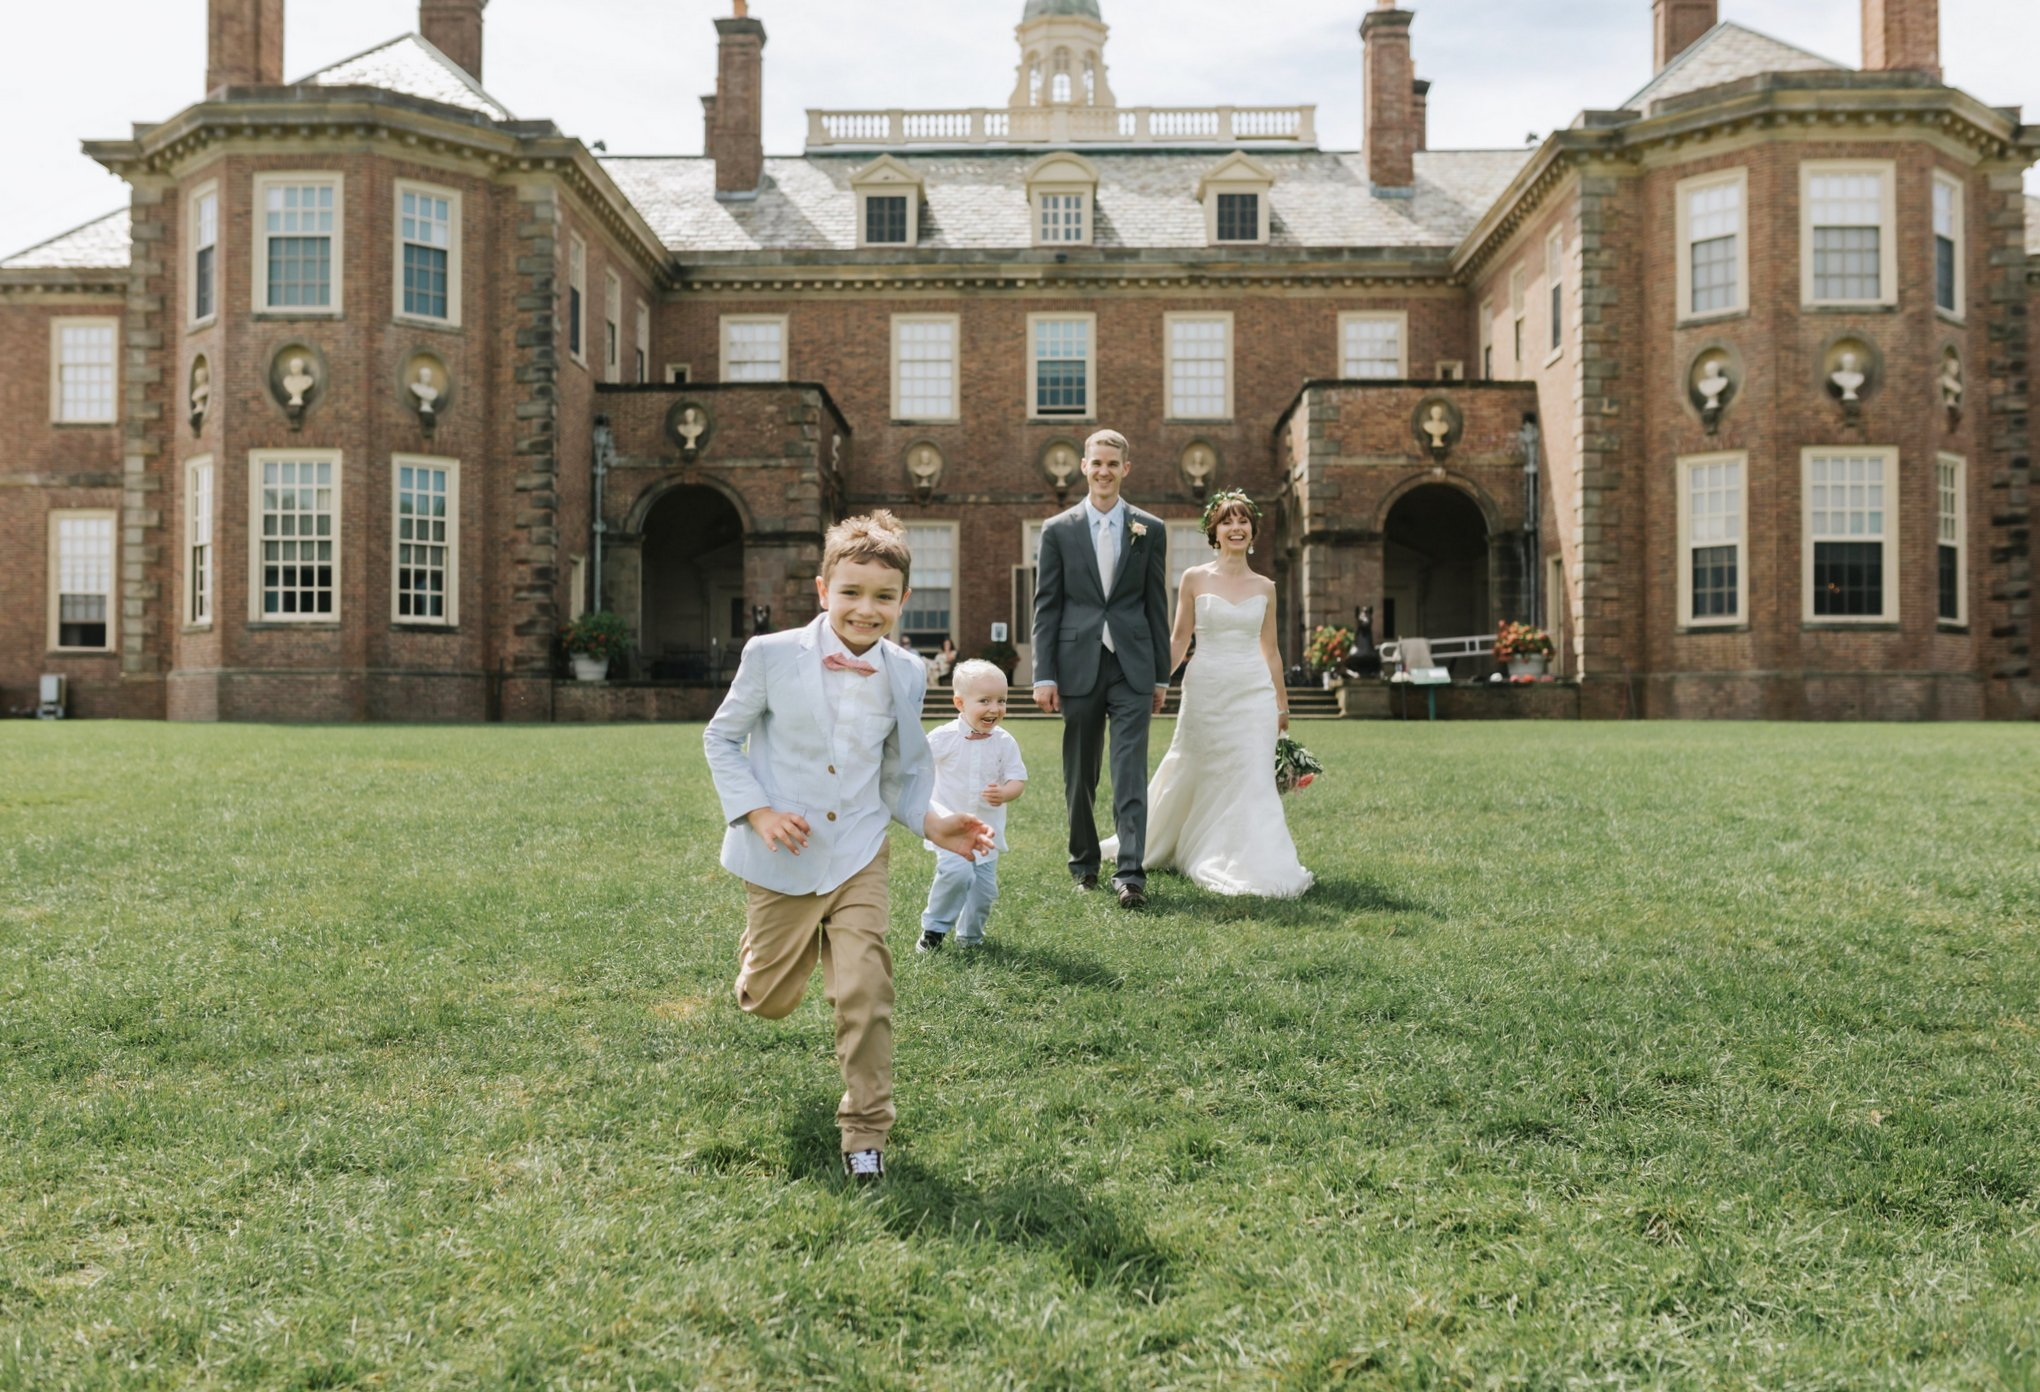 Crane-Estate-Vow-Renewal-Wedding-15.JPG